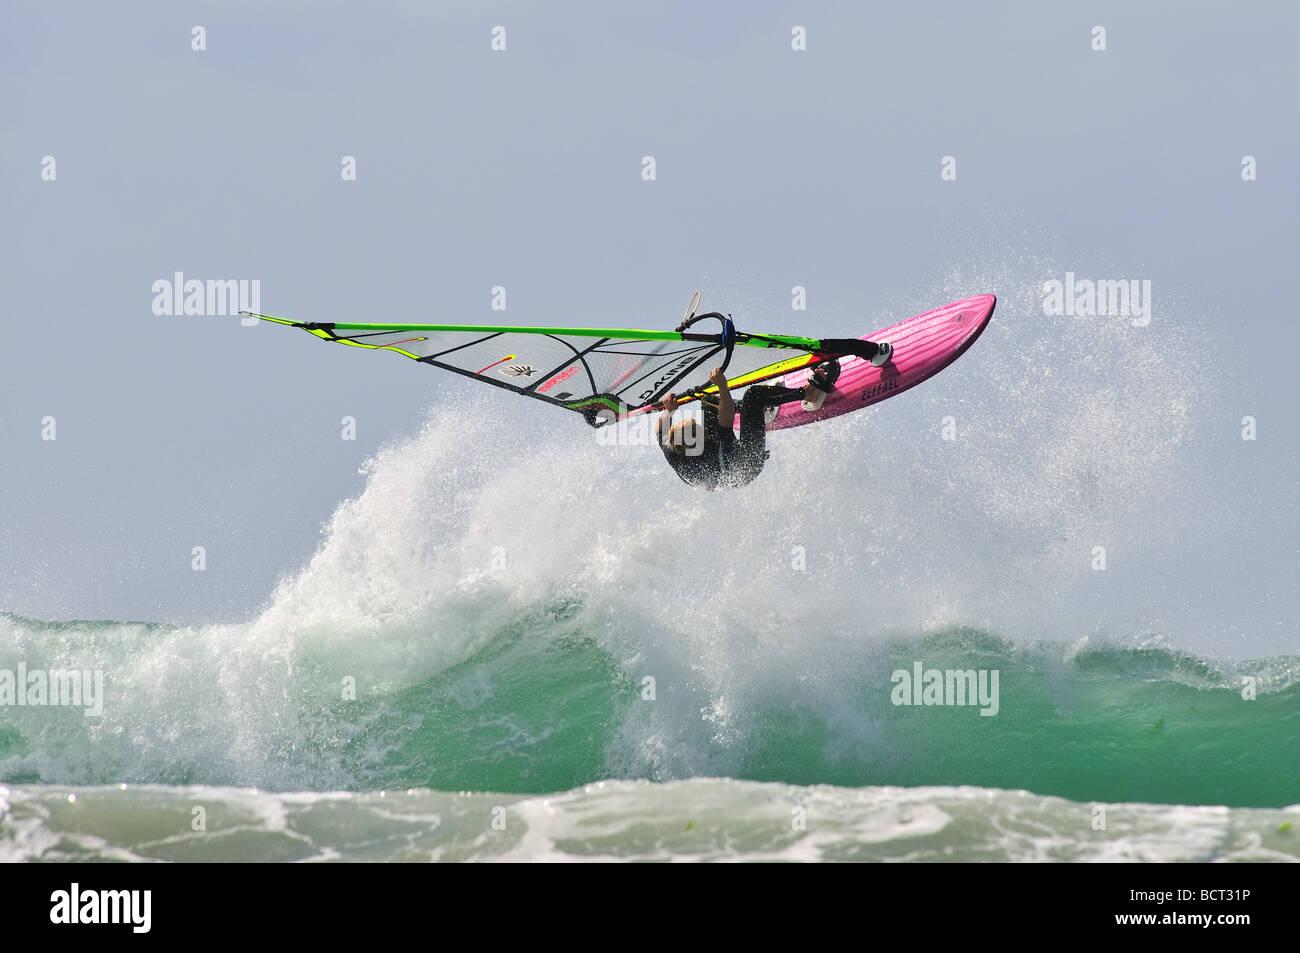 Session windsurf Bretagne - Stock Image